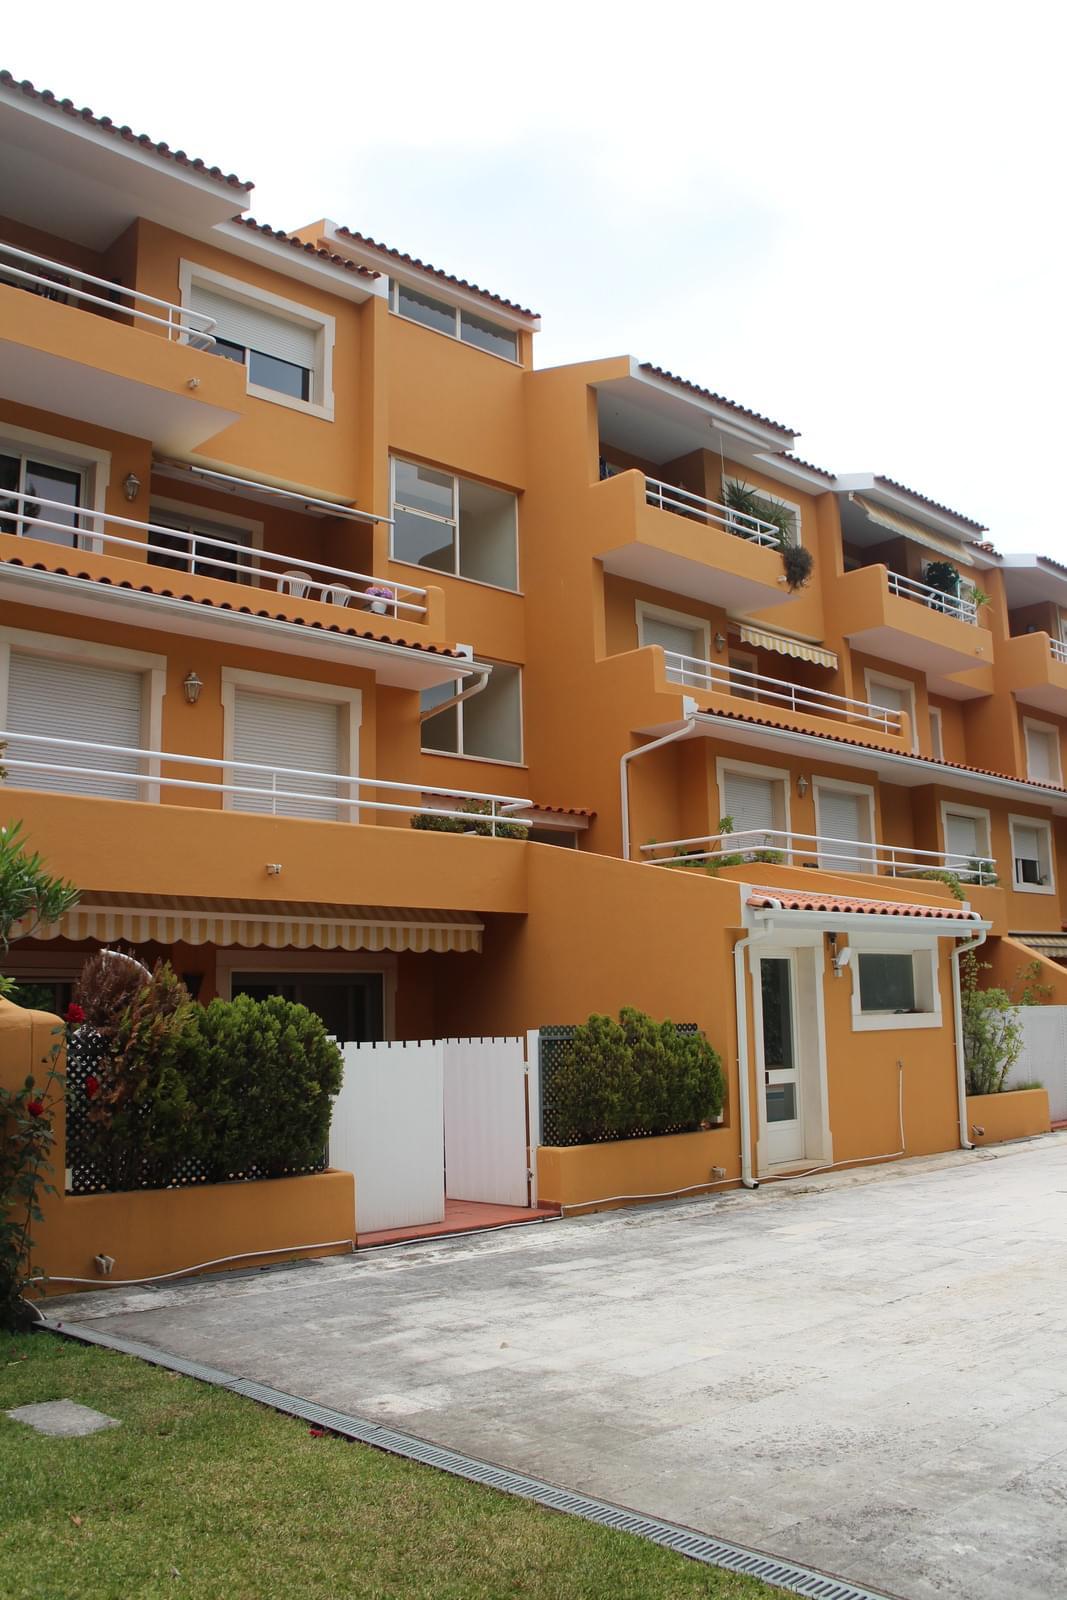 pf17538-apartamento-t2-cascais-625f47d8-5629-4568-a232-f08a57aa4057